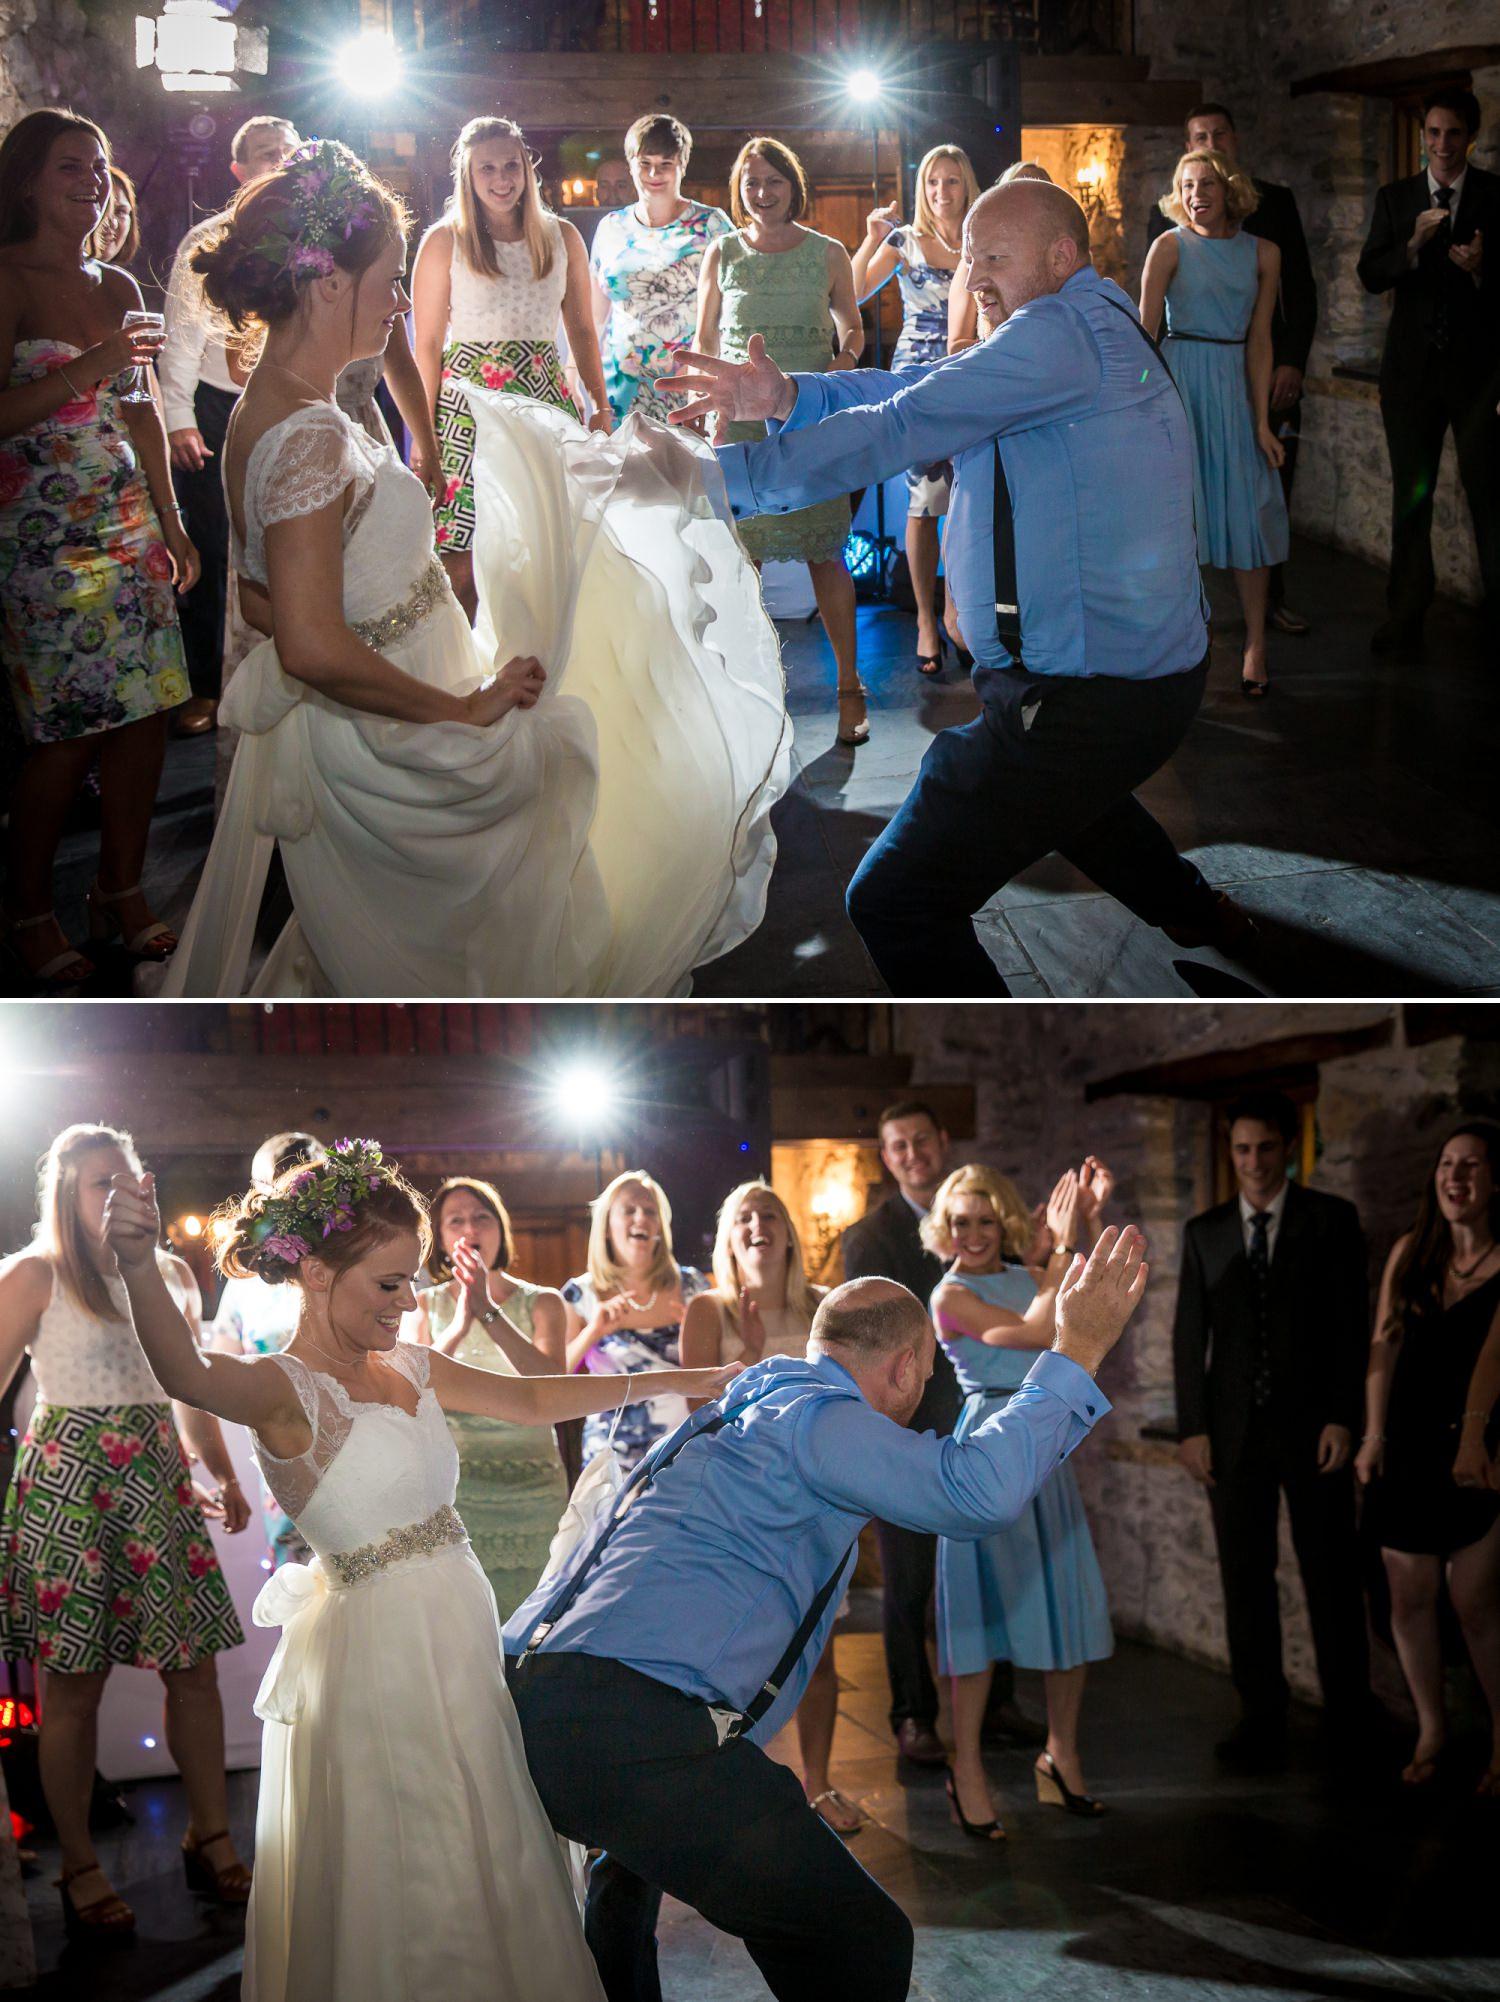 evening dancing at wedding photograph at Plas Isaf